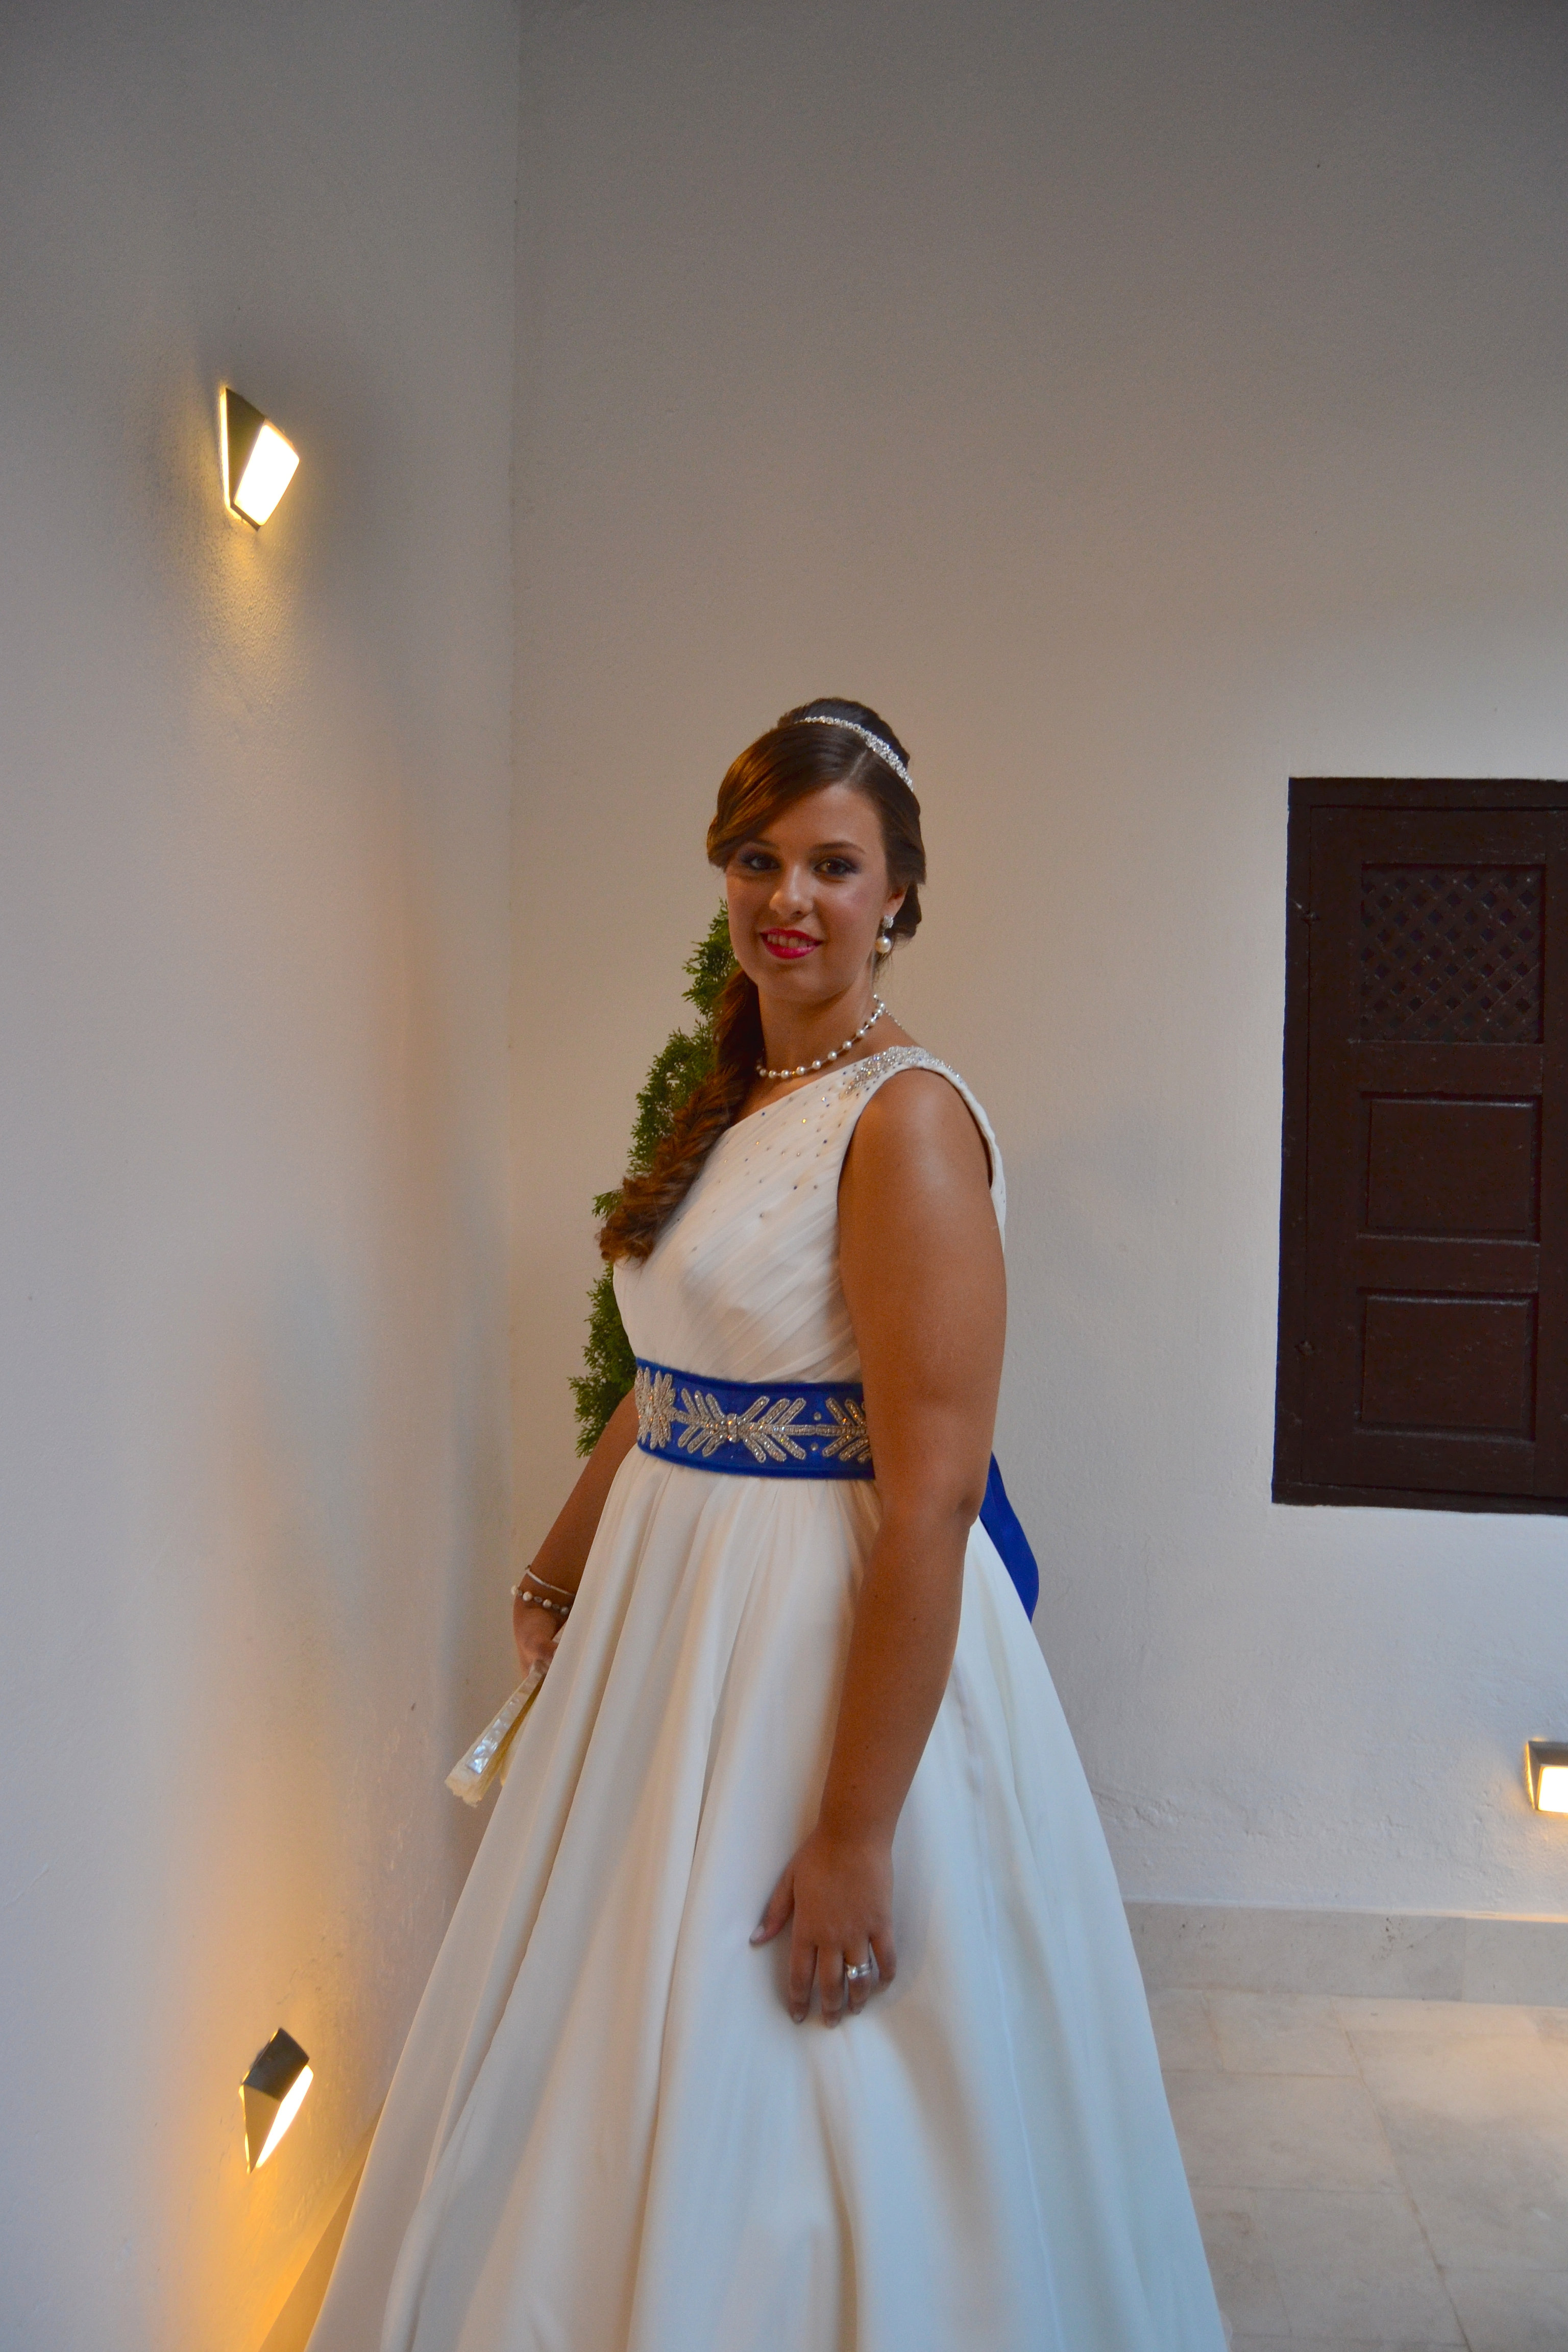 Hilos de vestido de novia